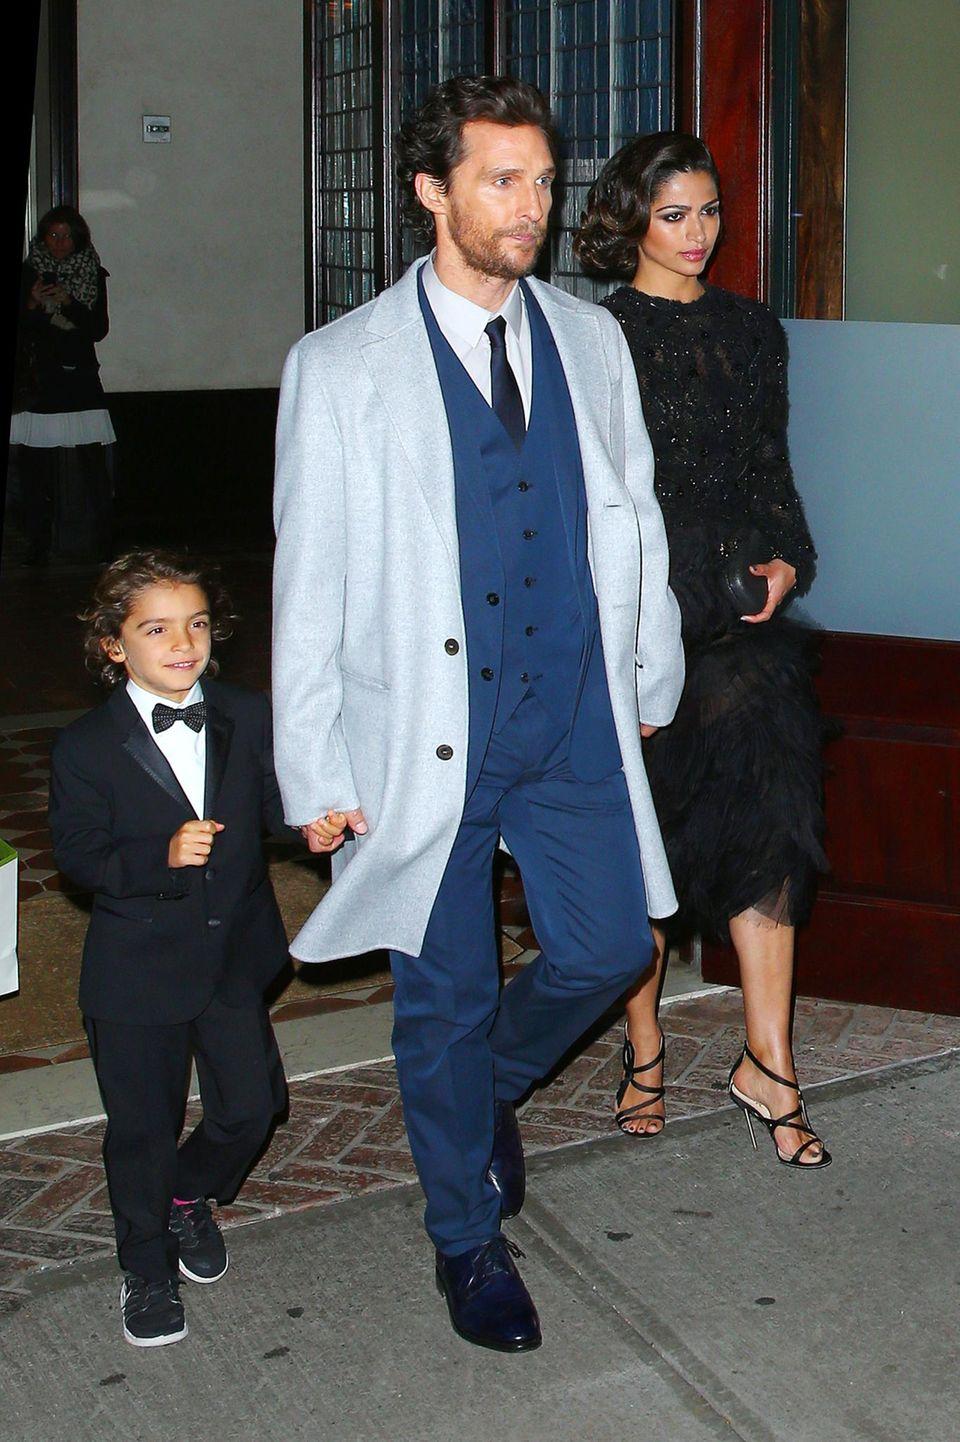 3. November 2014  Matthey McConaughey und Camila Alves verlassen mit Sohnemann Levi ein Hotel in New York City.